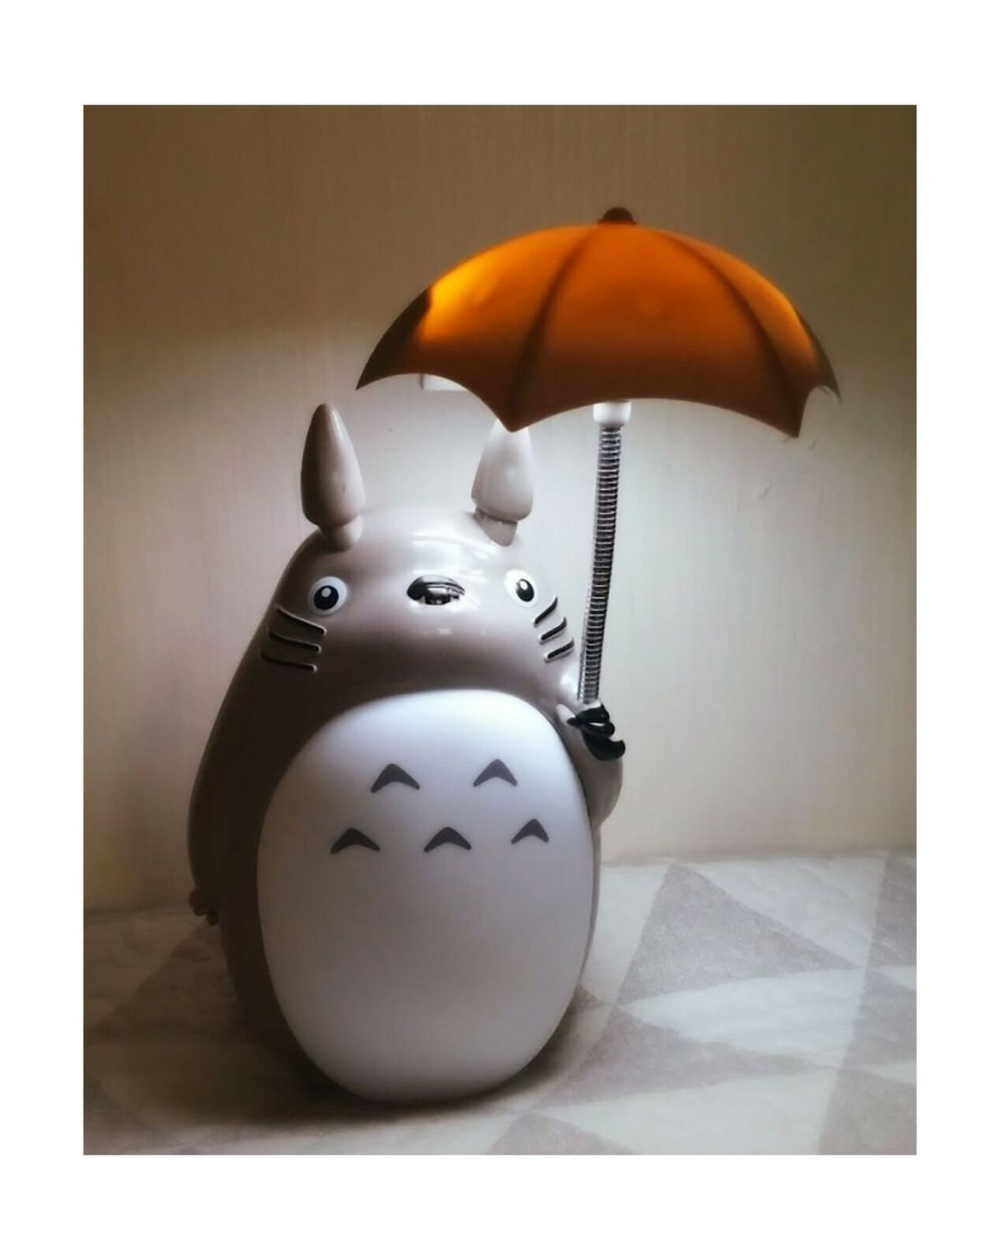 Studio Ghibli My Neighbour Totoro Usb Led Night Light Lamp For Kid S Bedroom In 2020 Night Light Kids Led Night Light Night Light